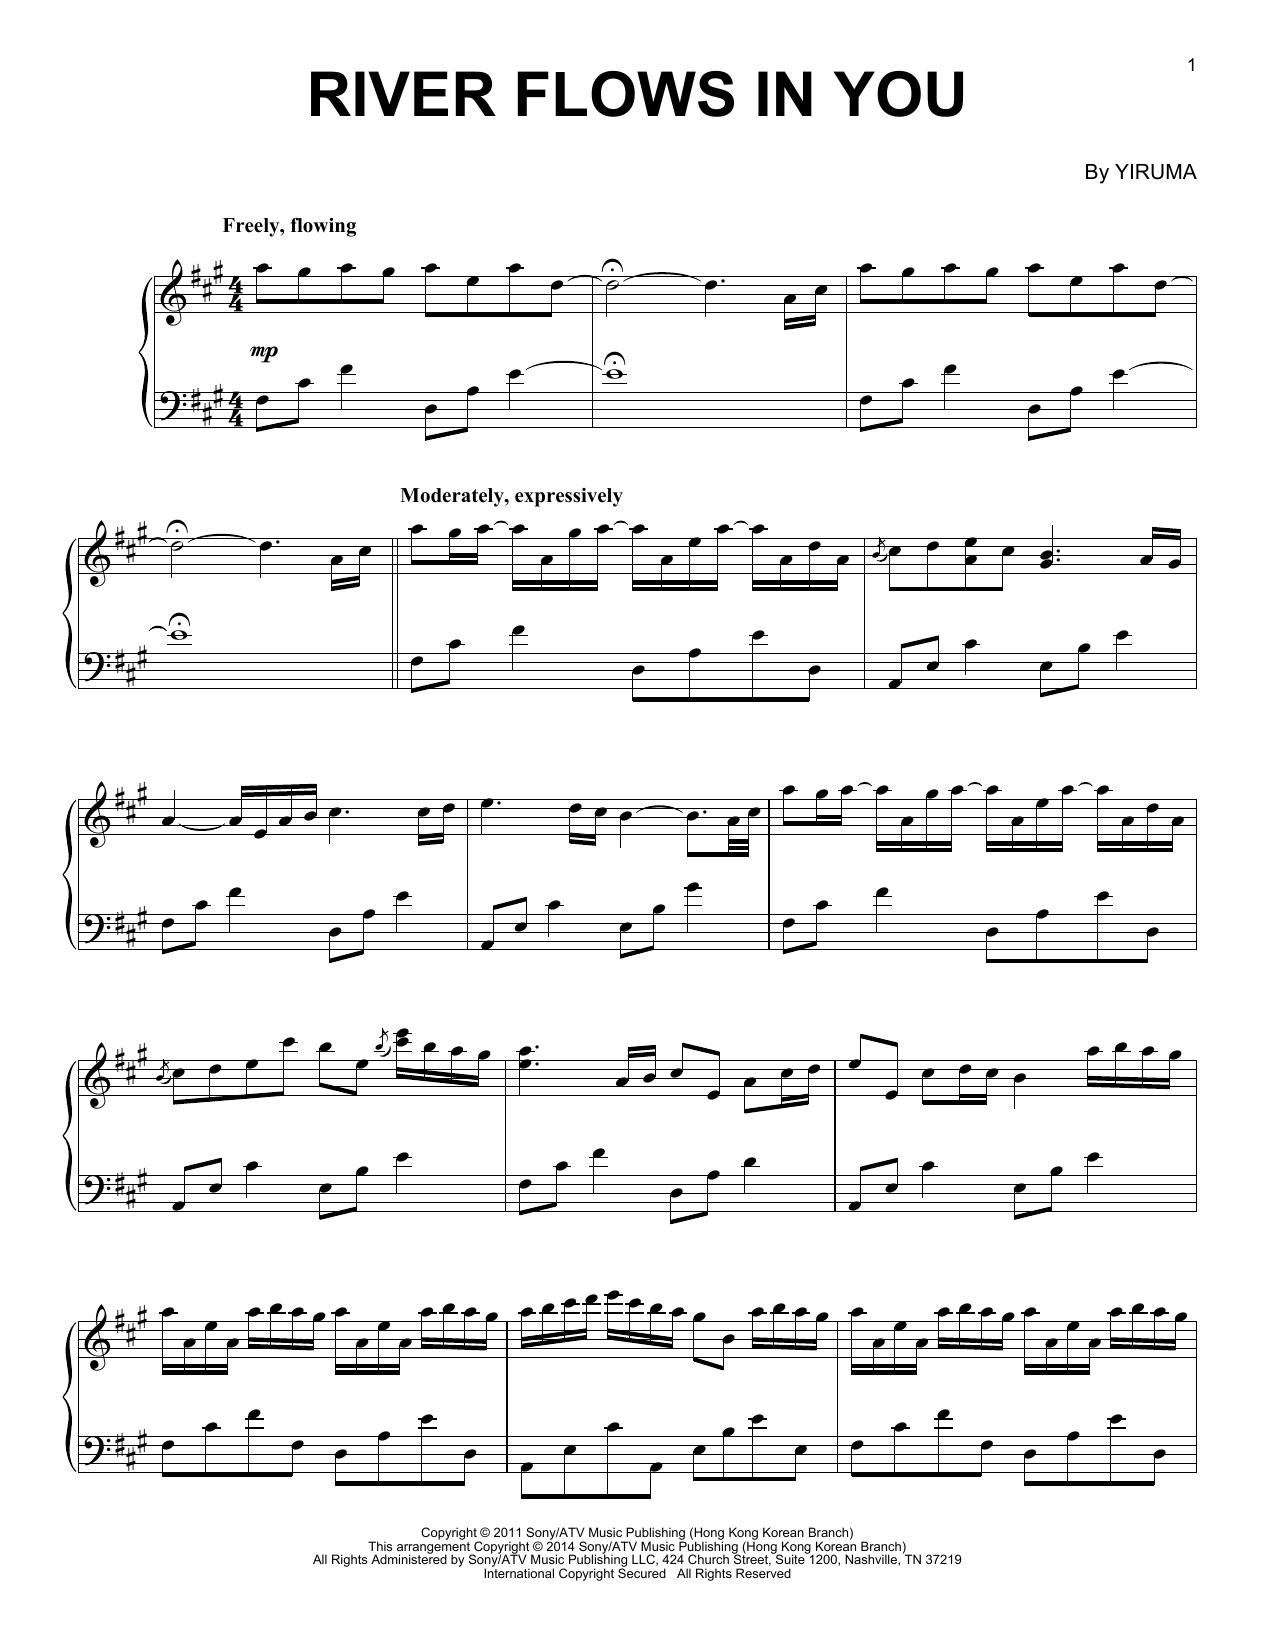 River Flows In You Piano Sheet Music Music Piano Sheetmusic Notes Sheet Music Notes River Flow In You Piano Sheet Music